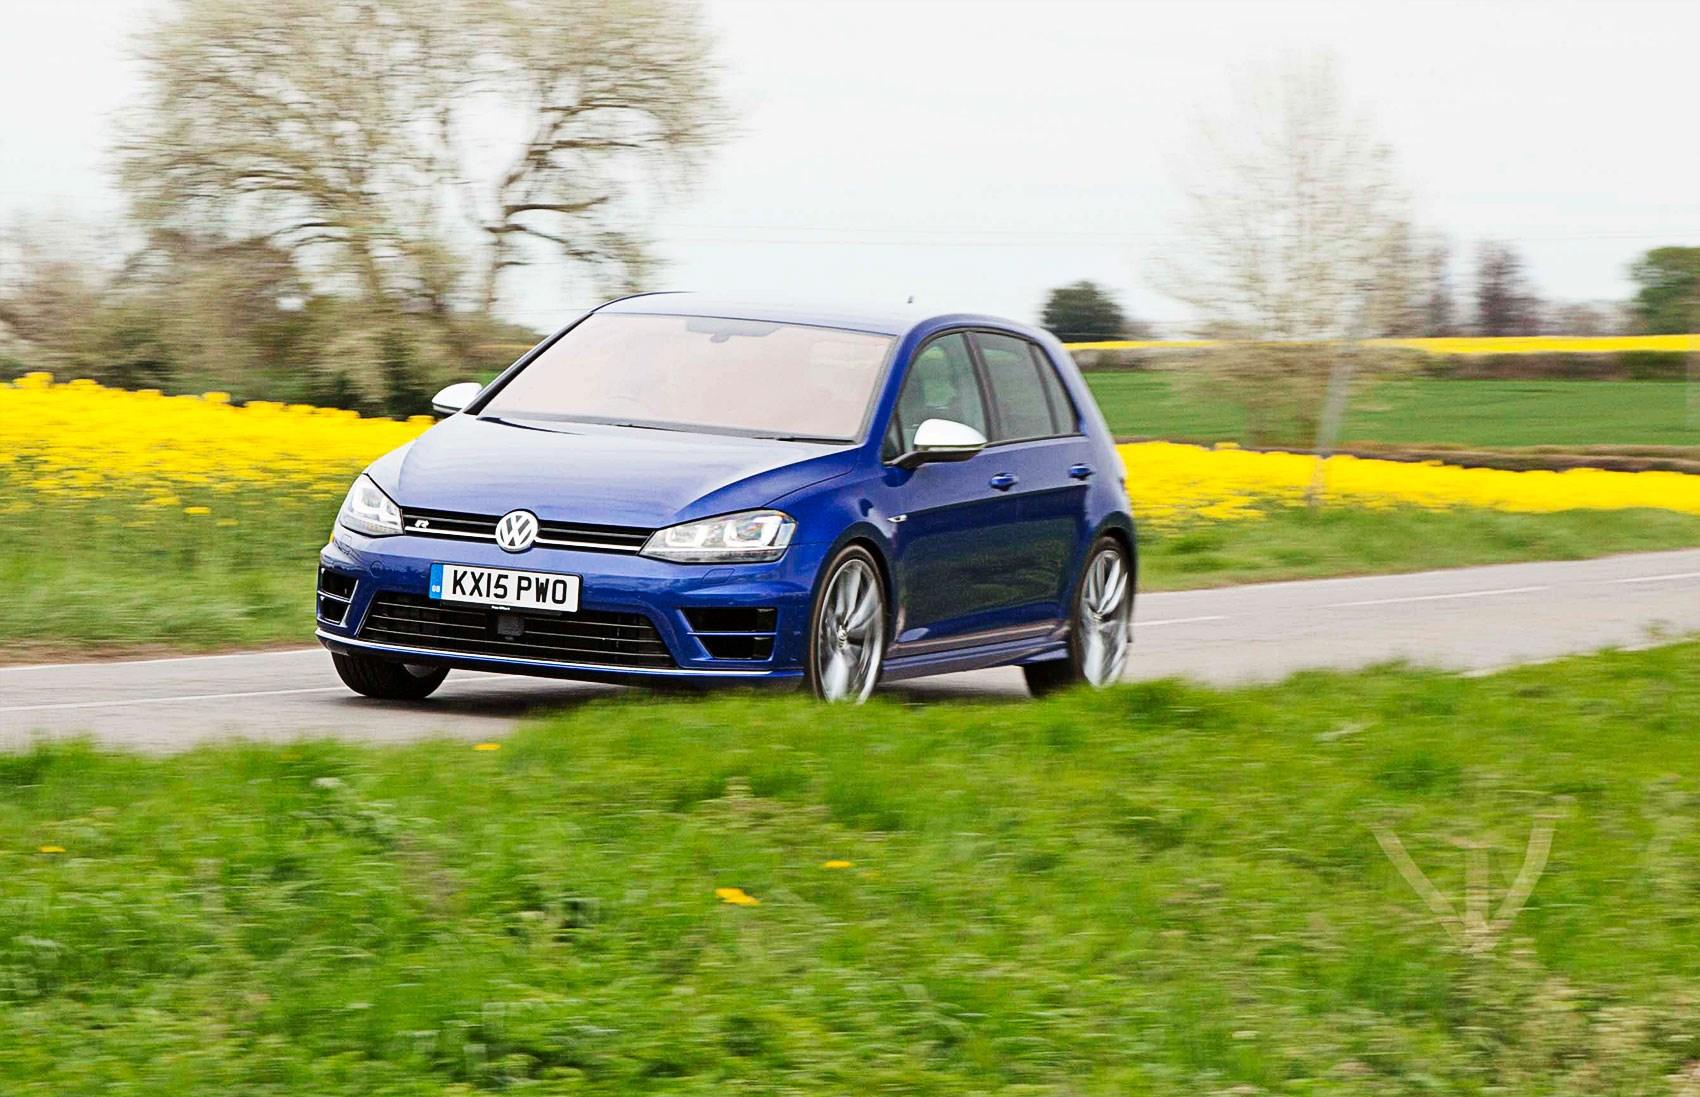 VW Golf R (2016) long-term test review | CAR Magazine